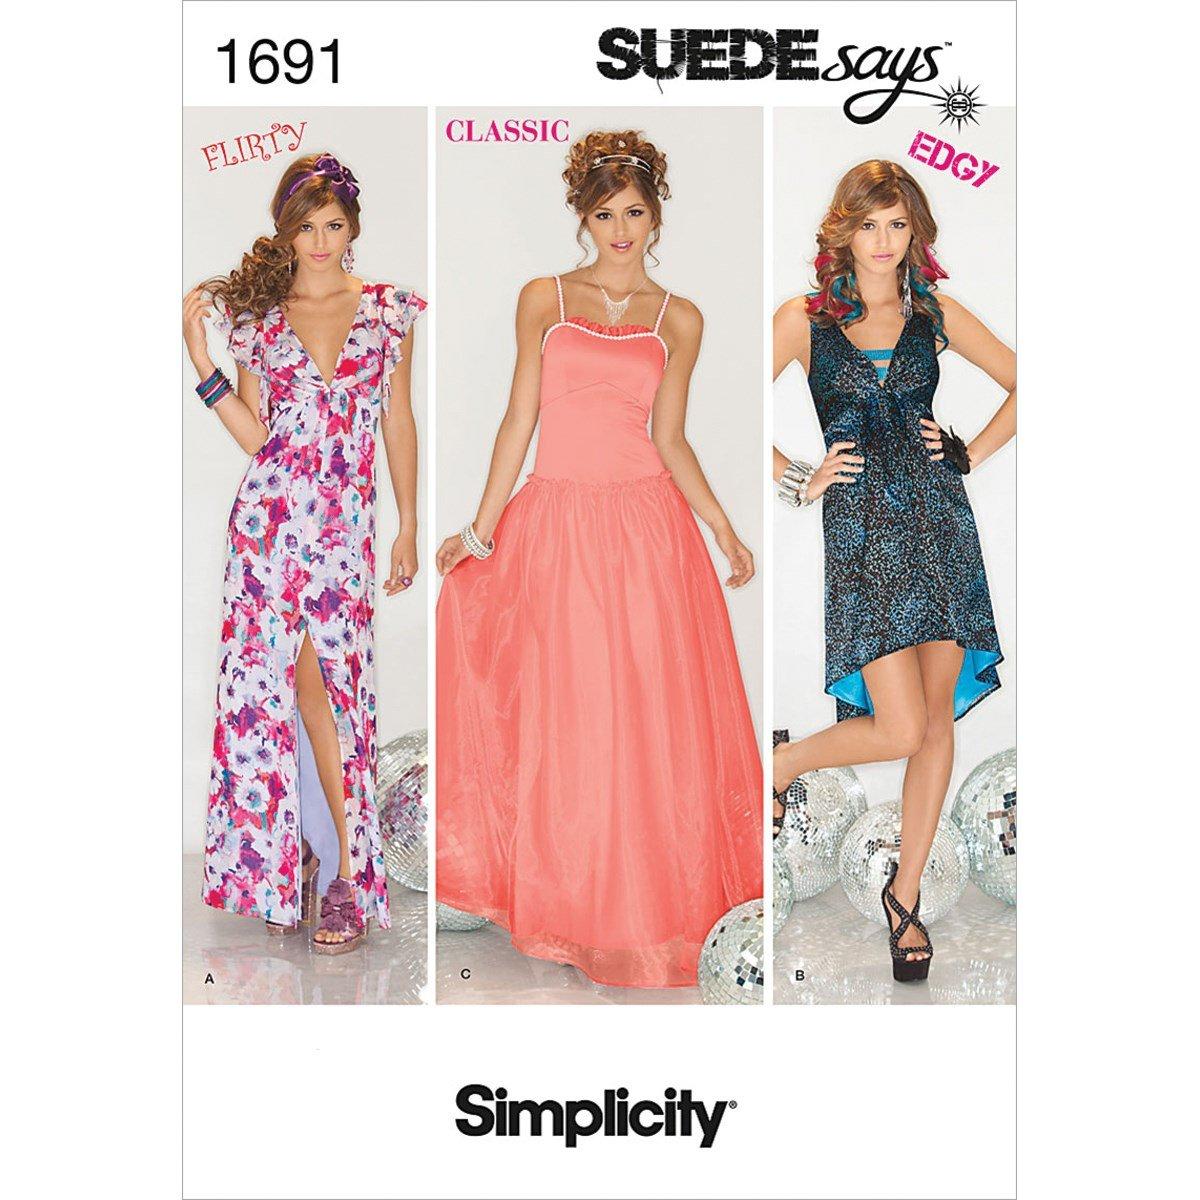 Simplicity 1691 Misses' Dresses SUEDEsays